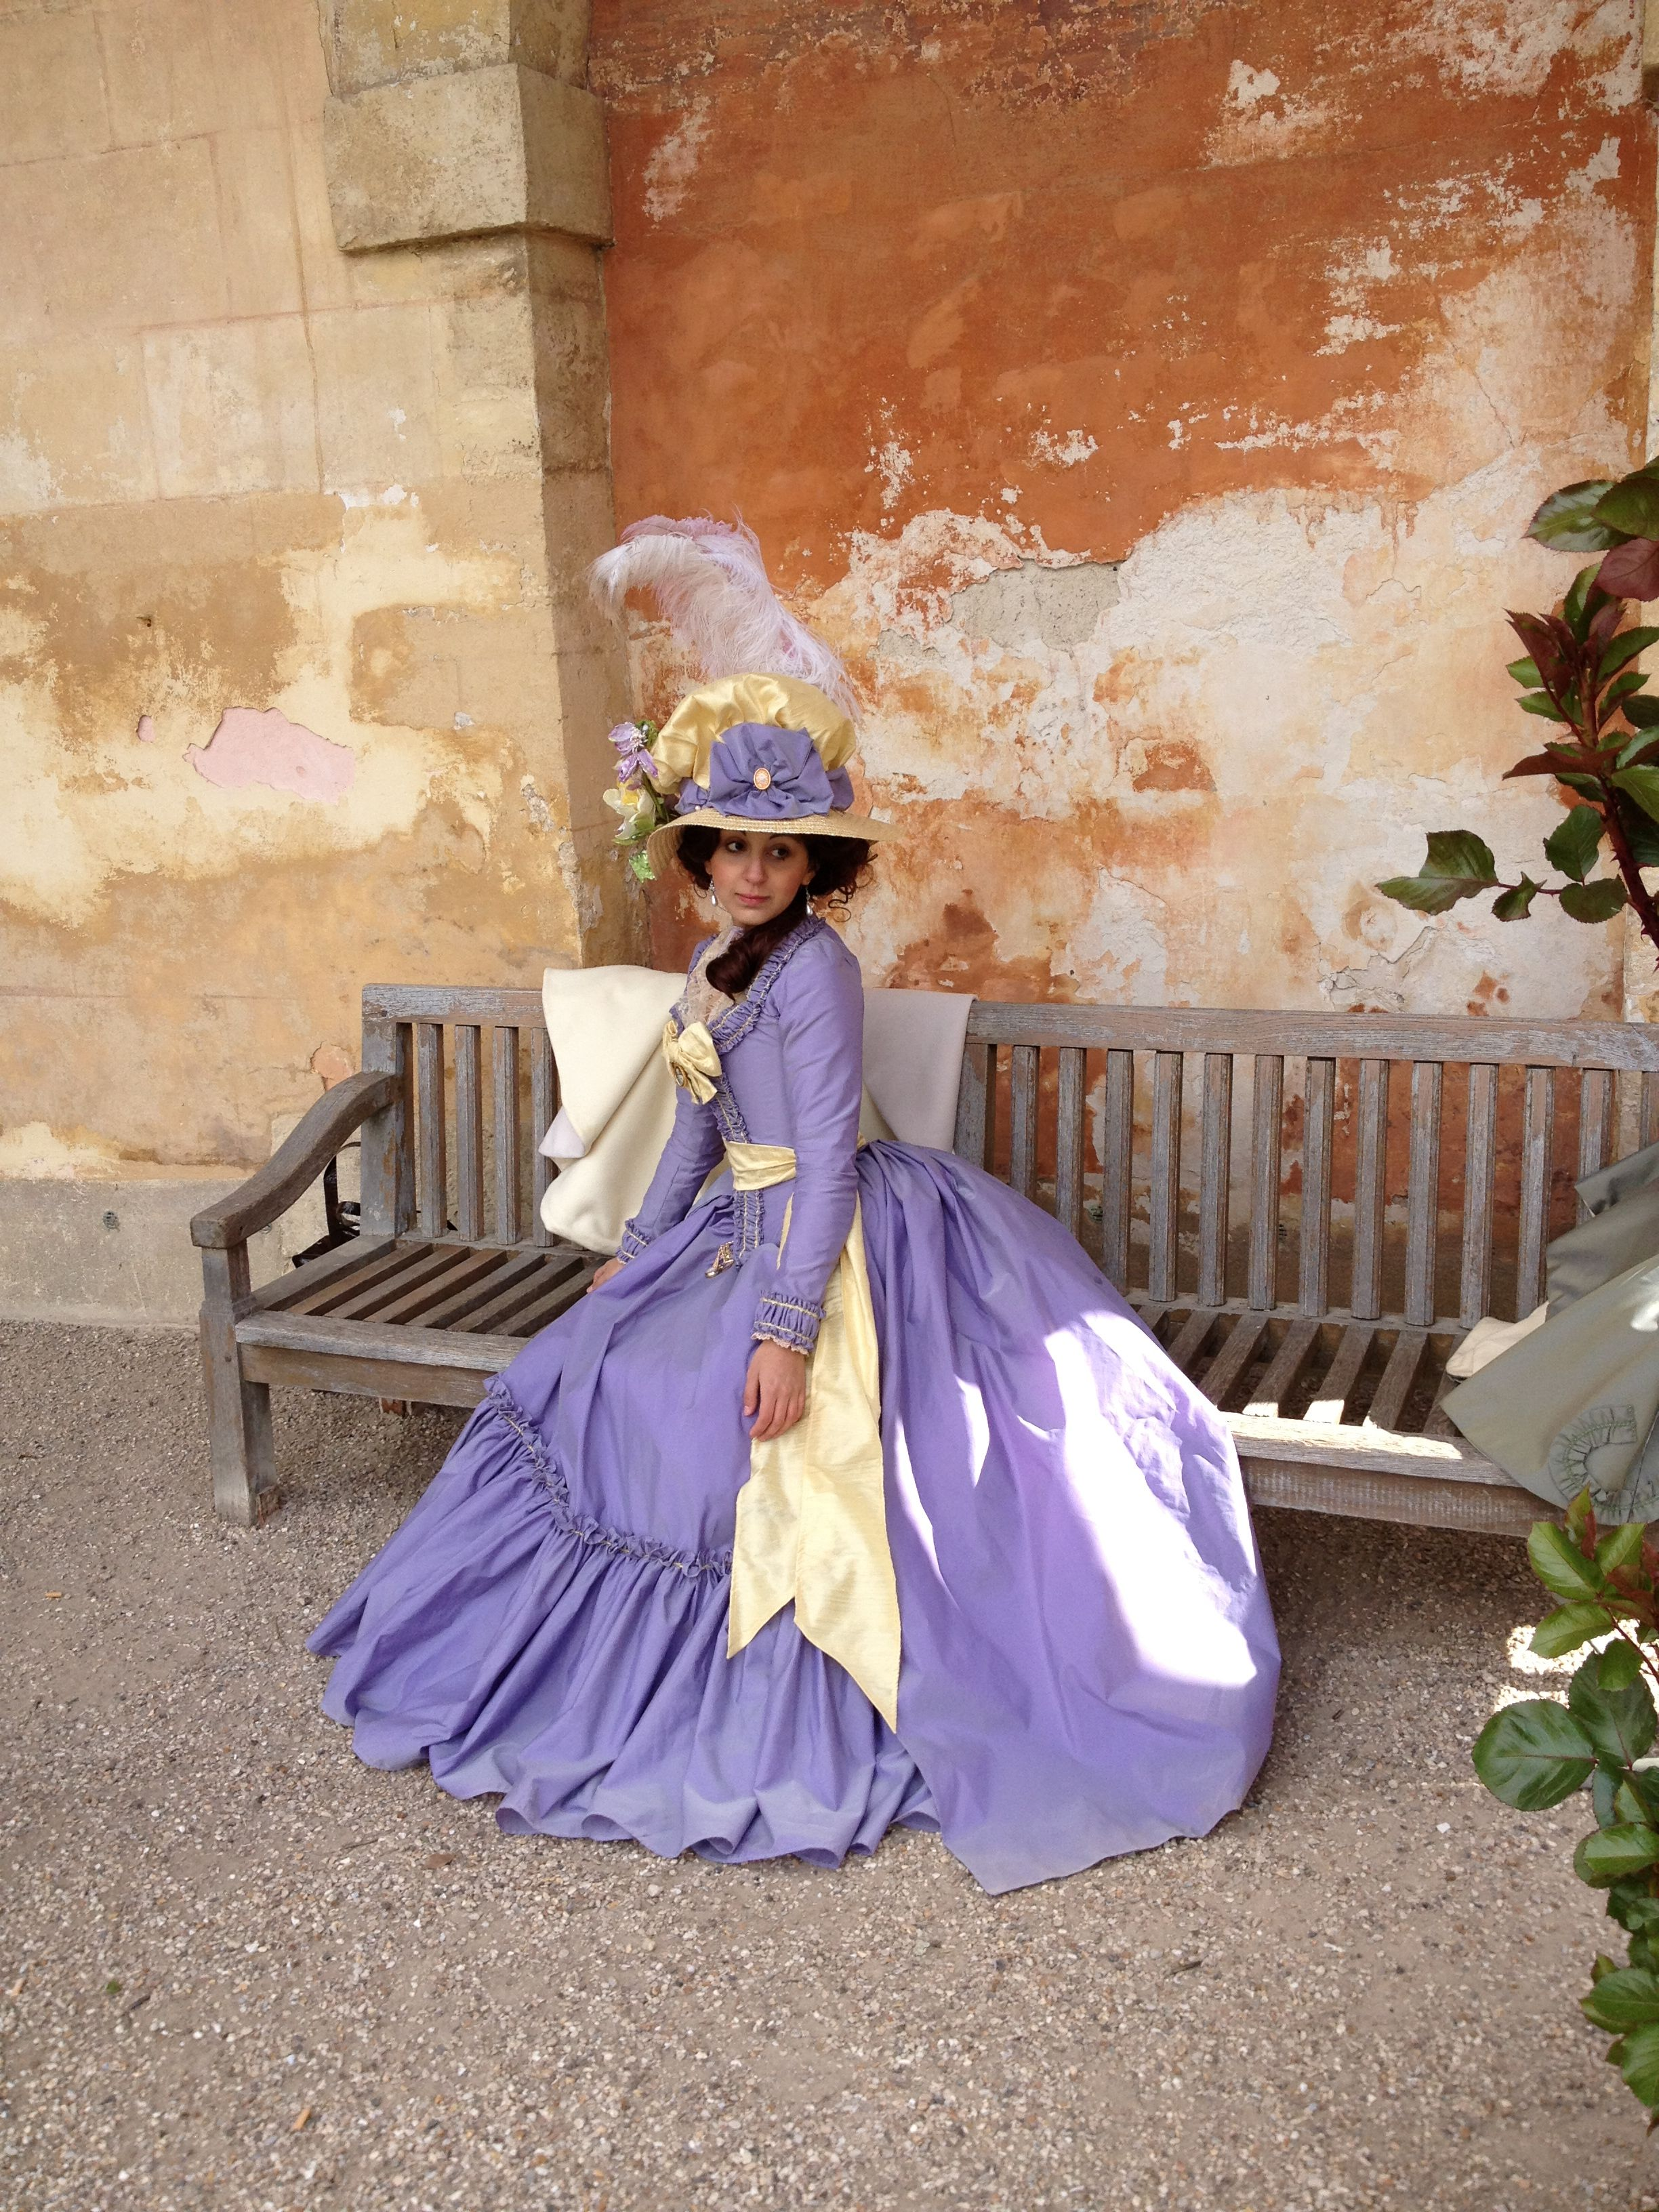 Robe à l'anglaise - XVIII century